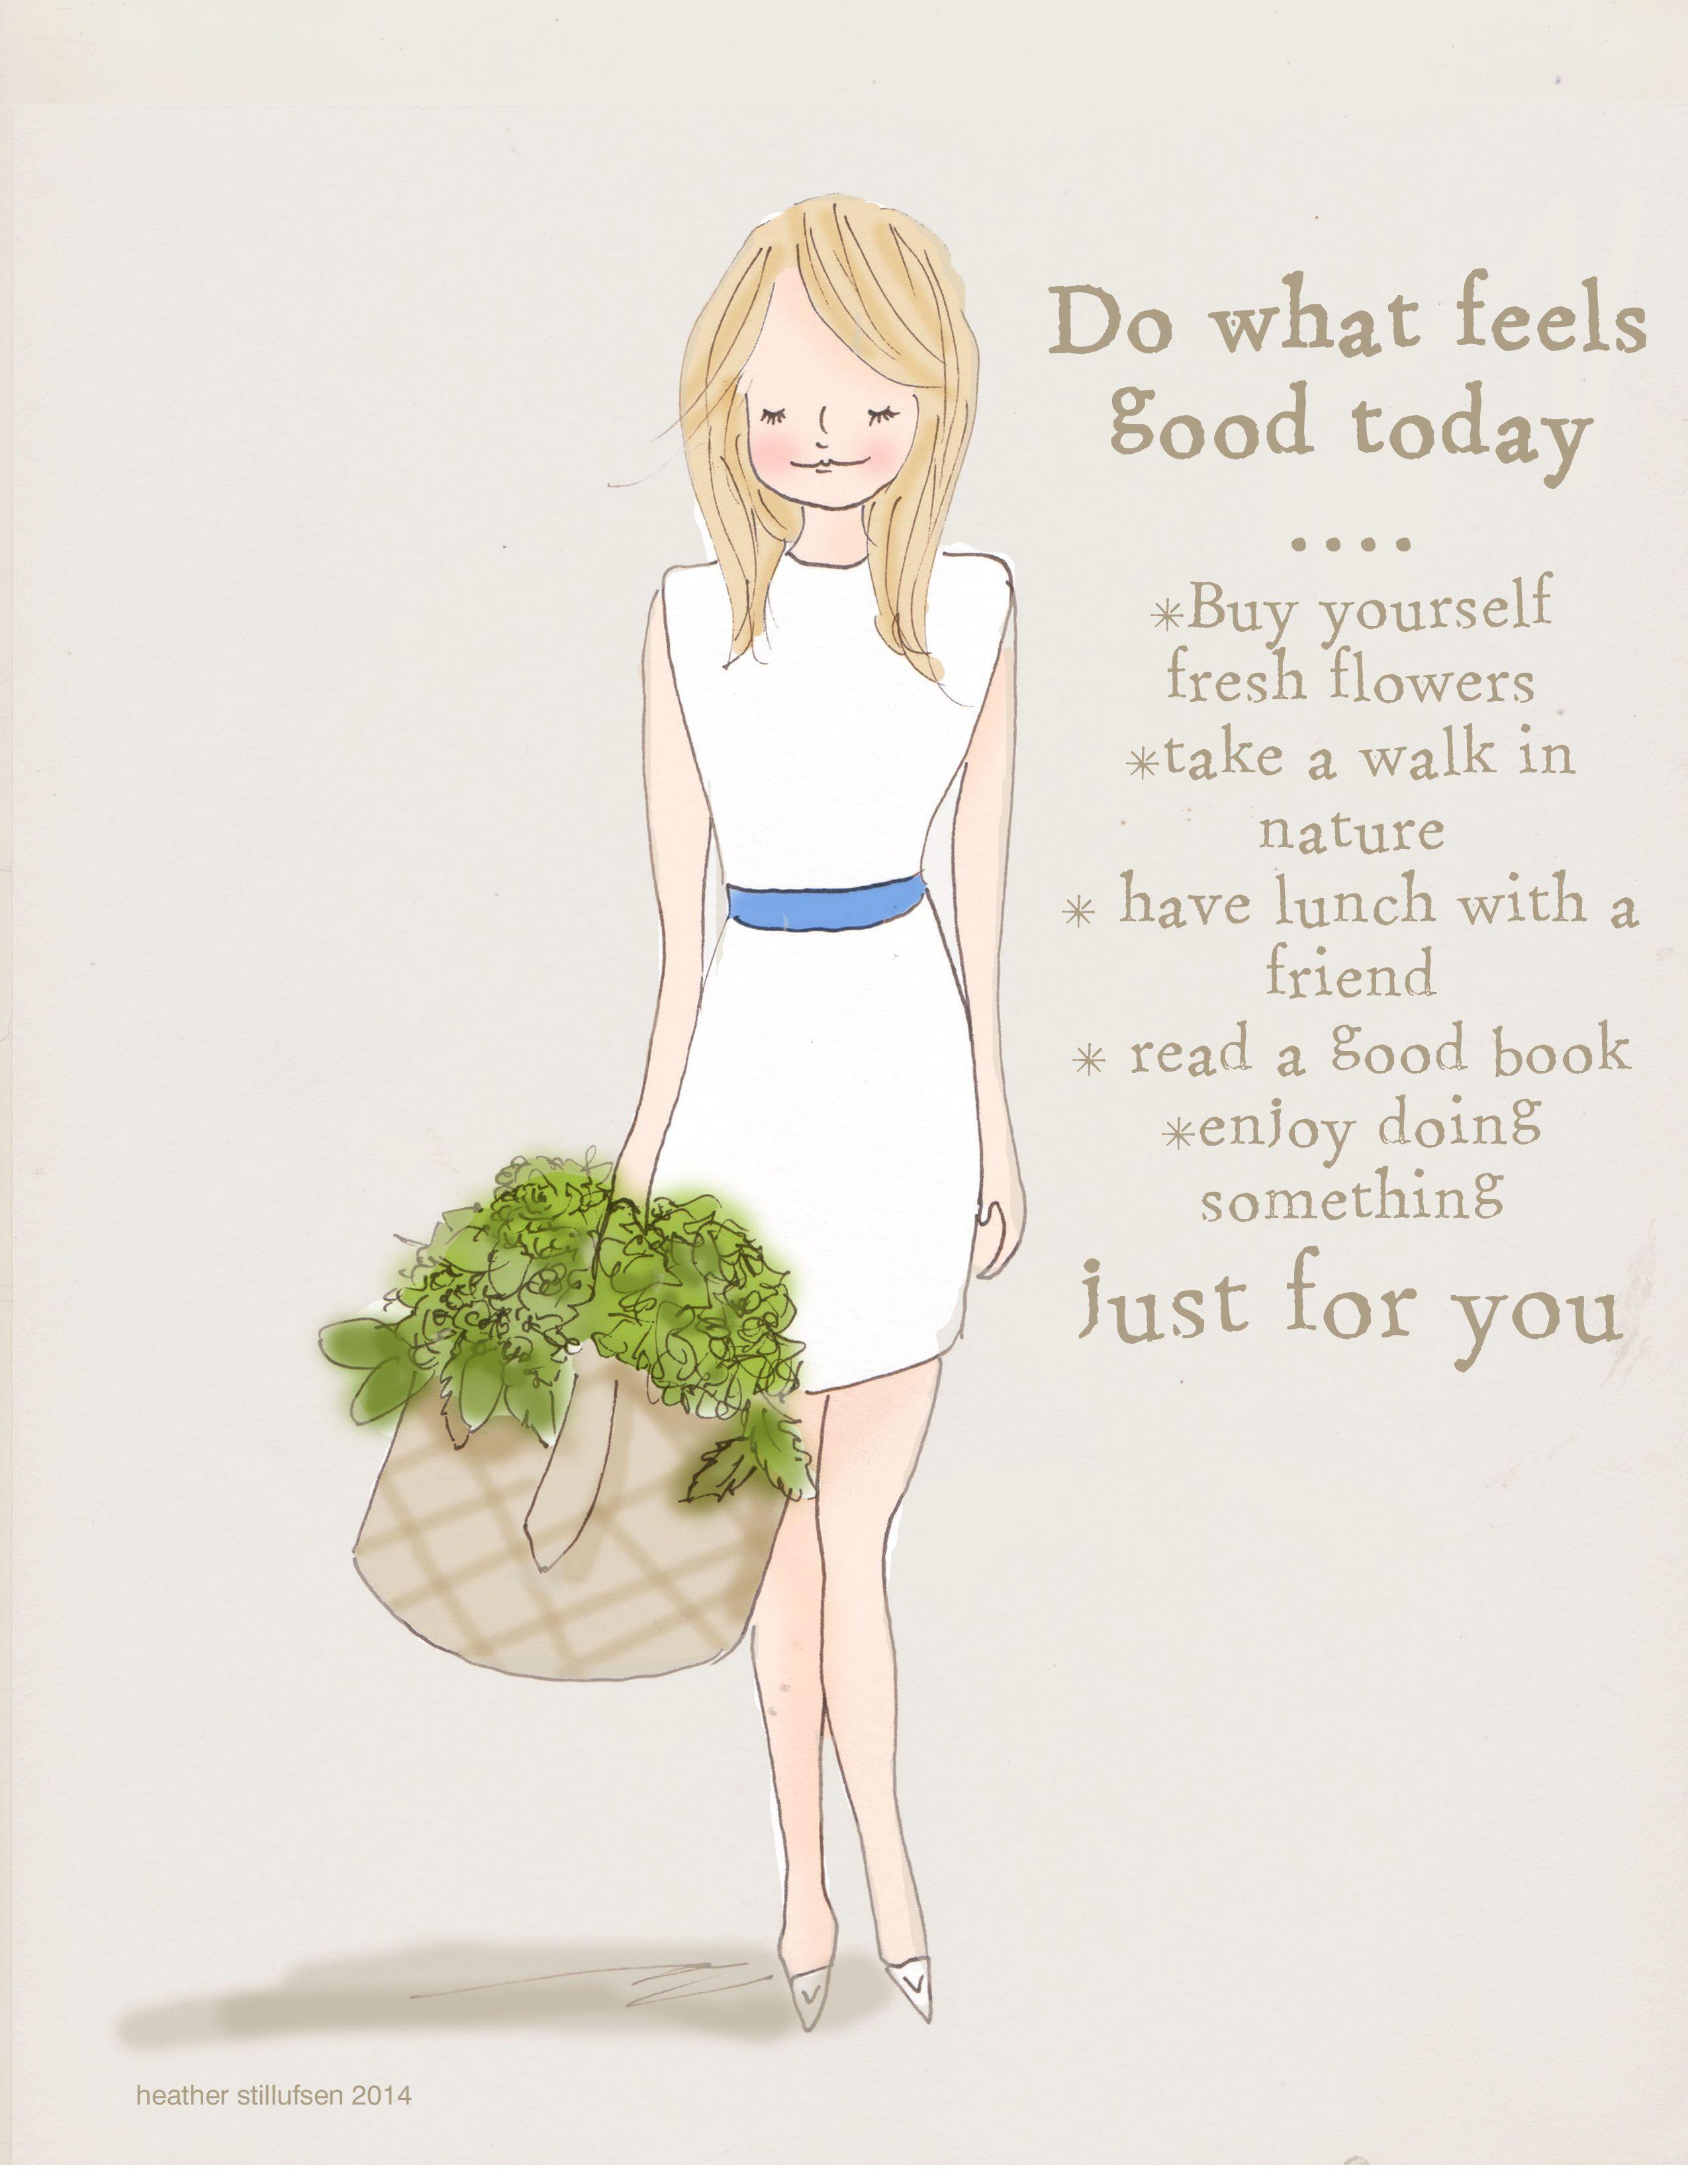 Do something good for yourself today www.rosehilldesignstudio.etsy